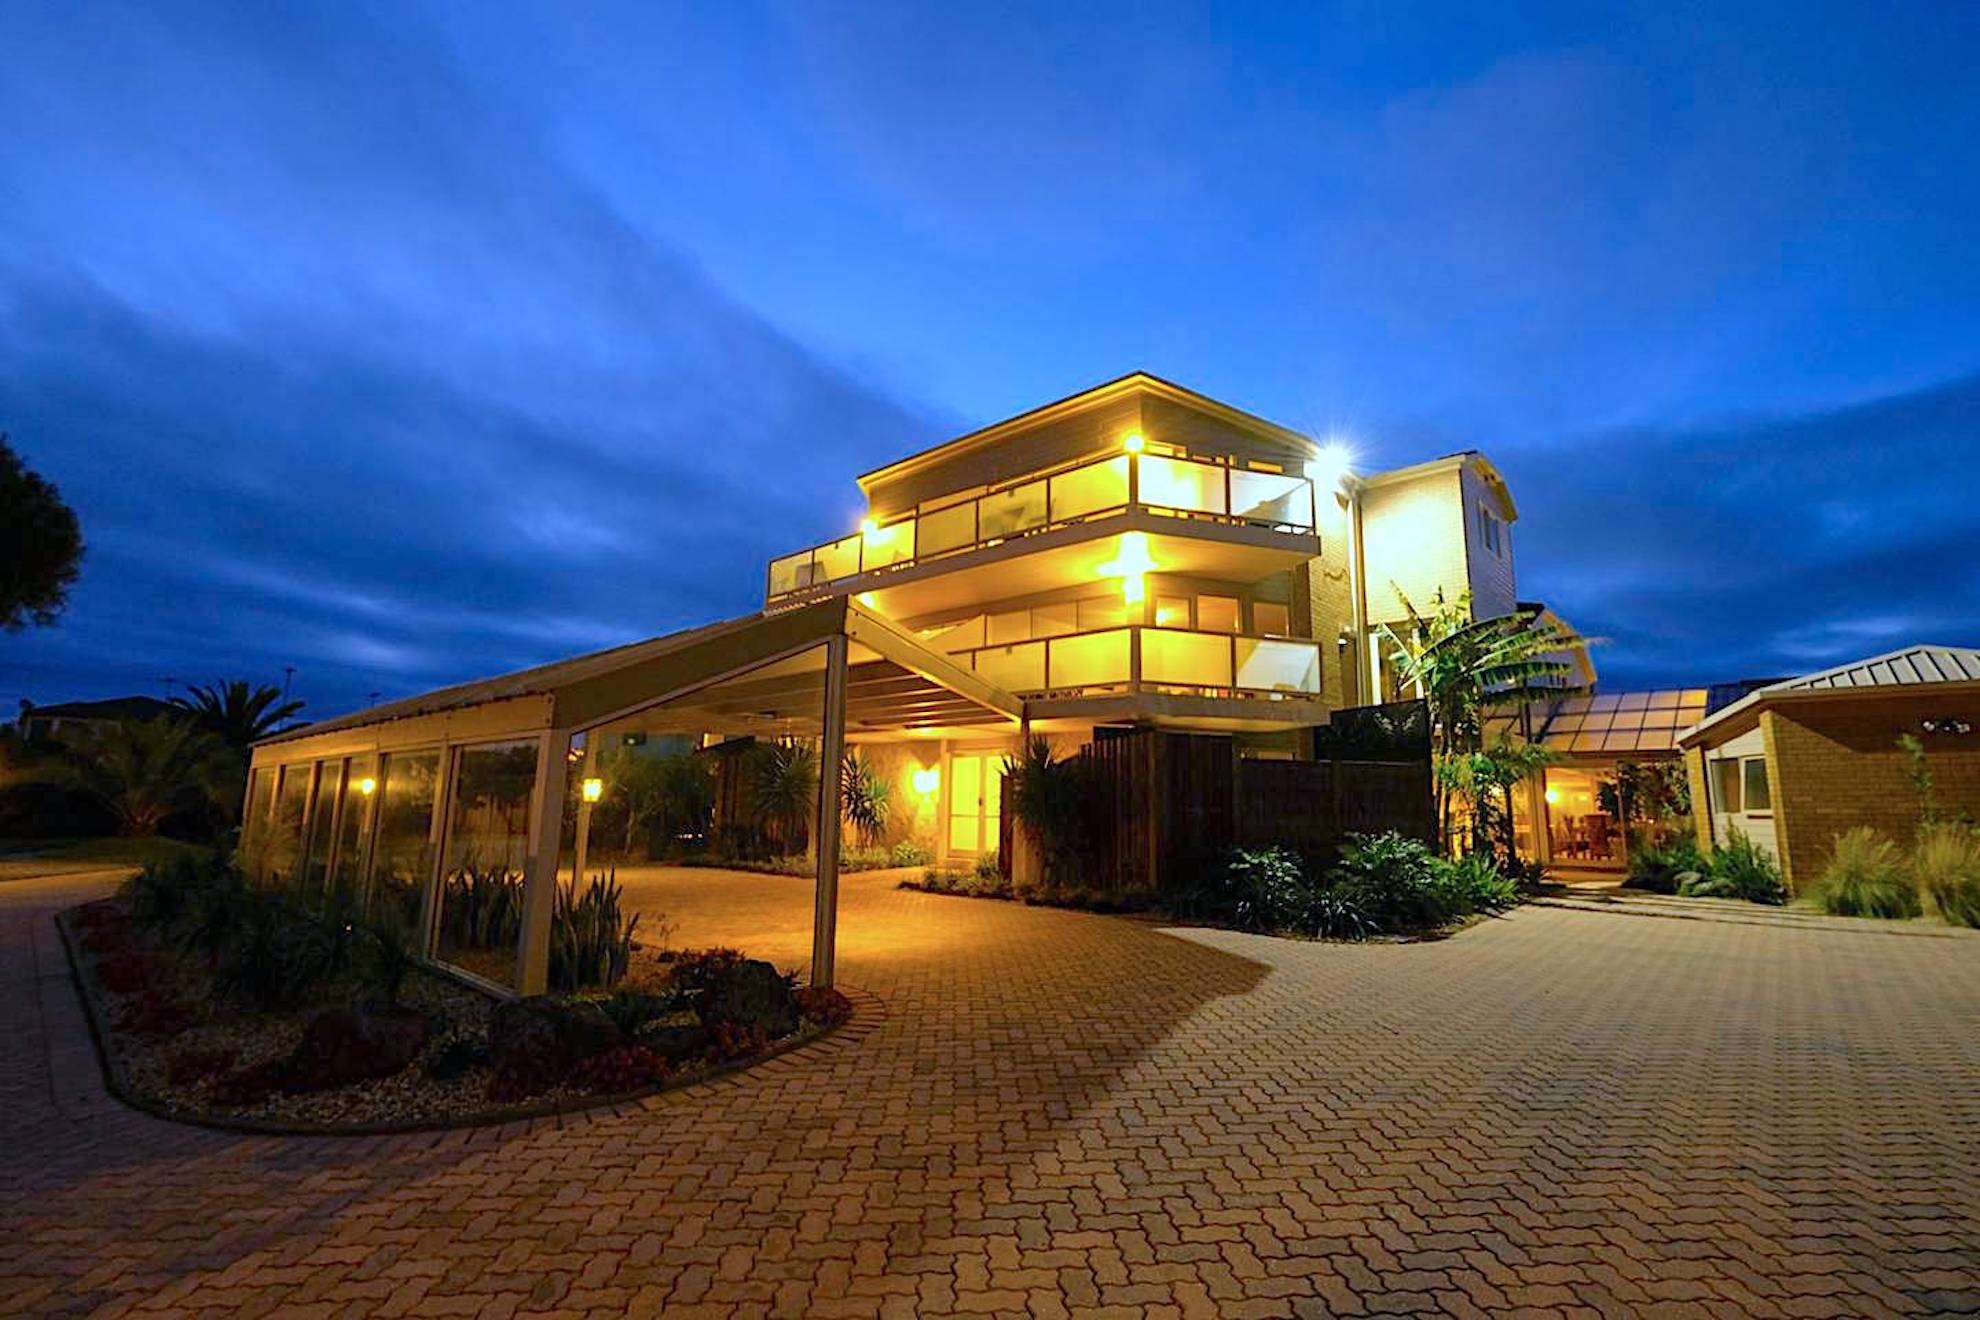 Whitesbeach Guesthouse Torquay Luxury